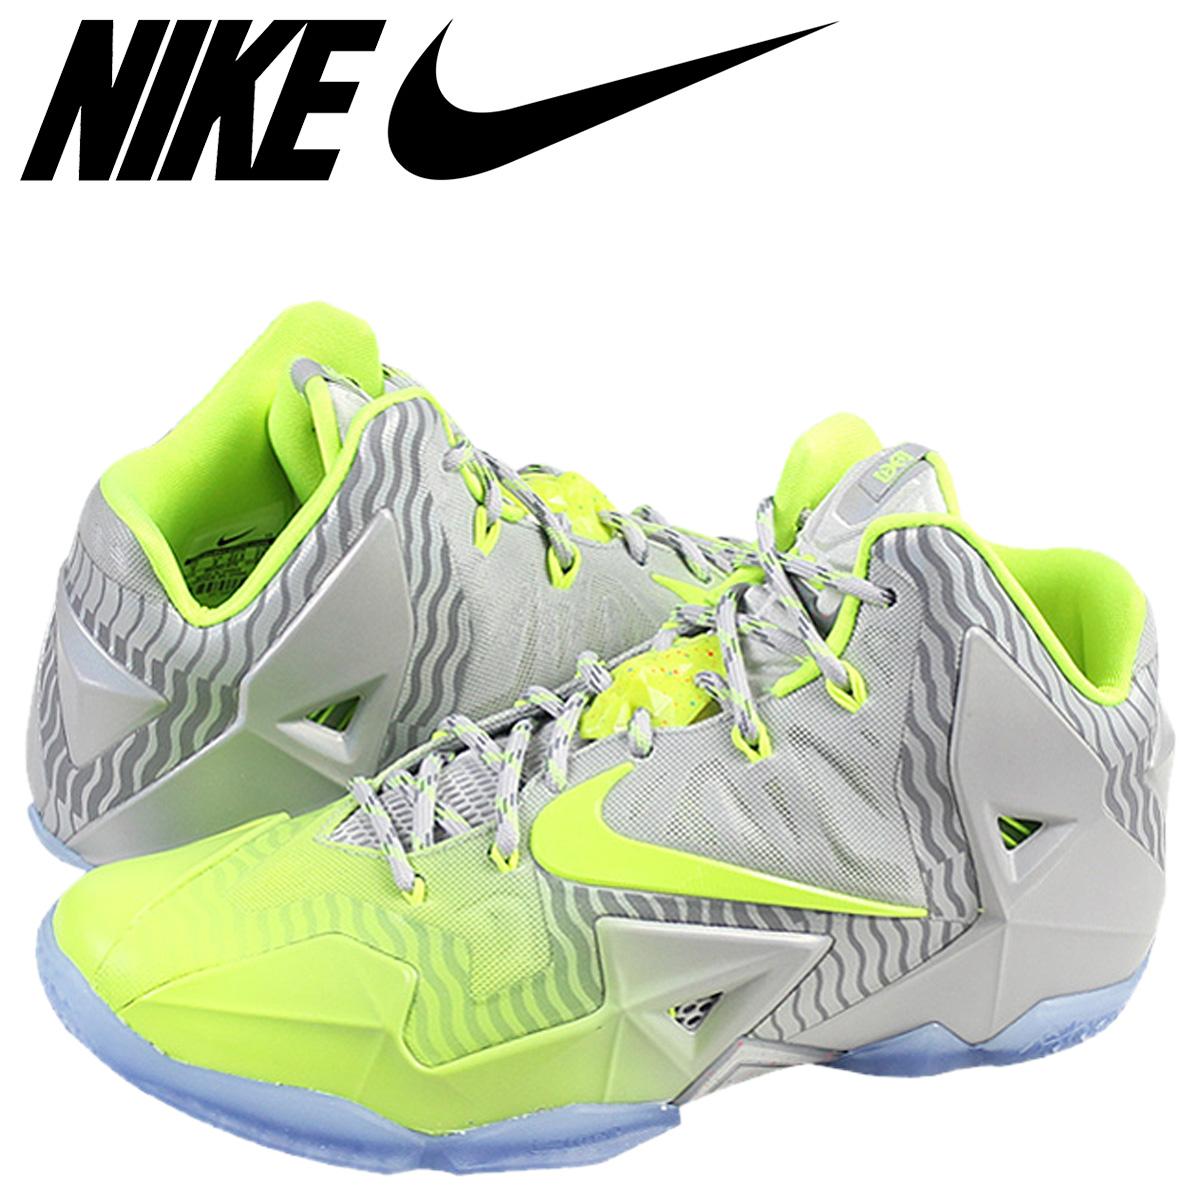 52e718b5a0f ALLSPORTS  Point 2 x Nike NIKE LEBRON 11 MAISON LEBRON COLLECTION ...